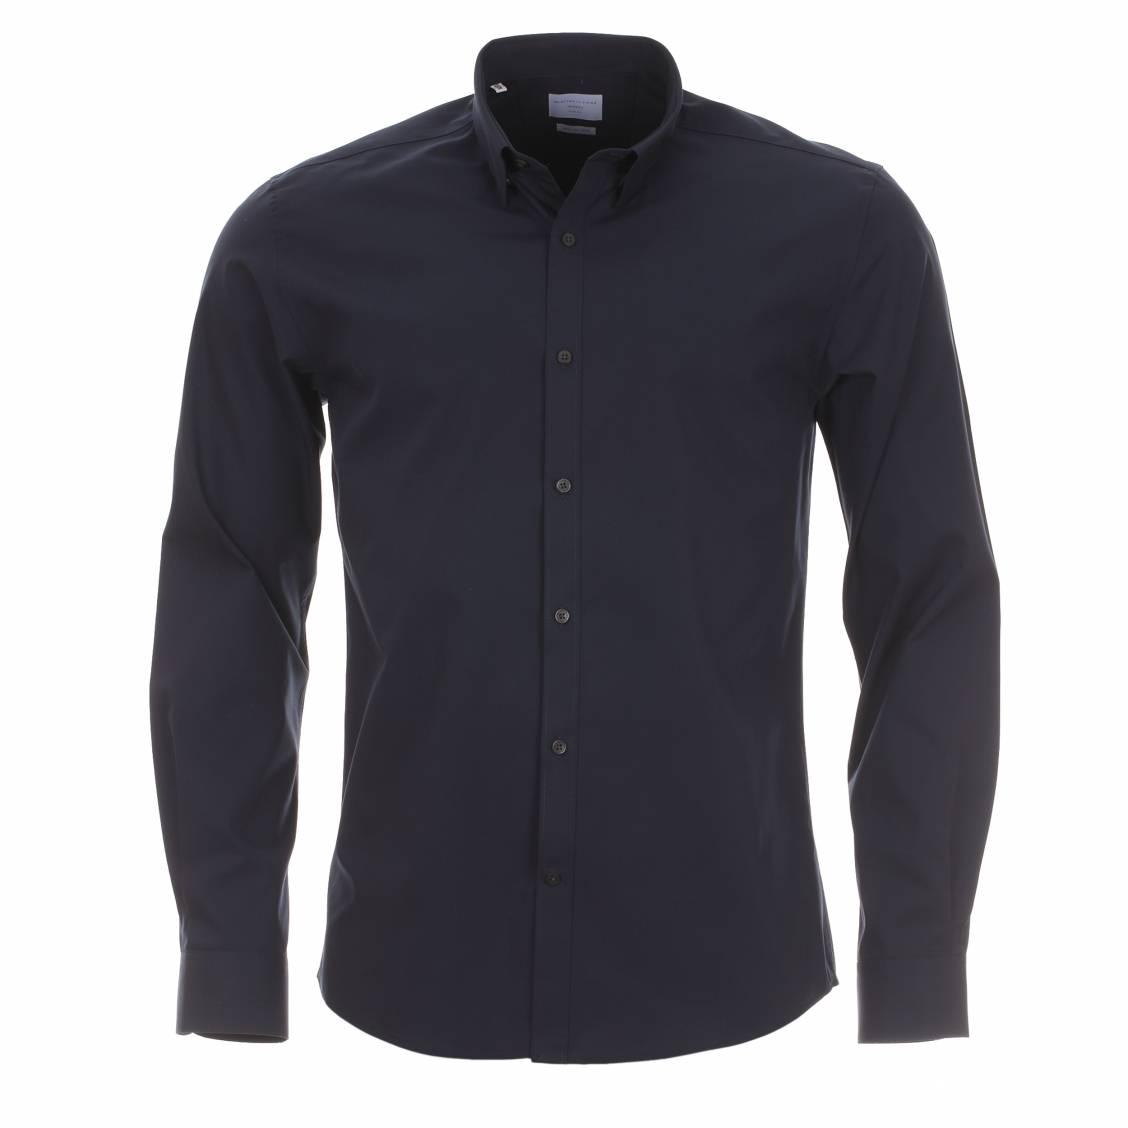 chemise homme selected bleu marine en coton stretch